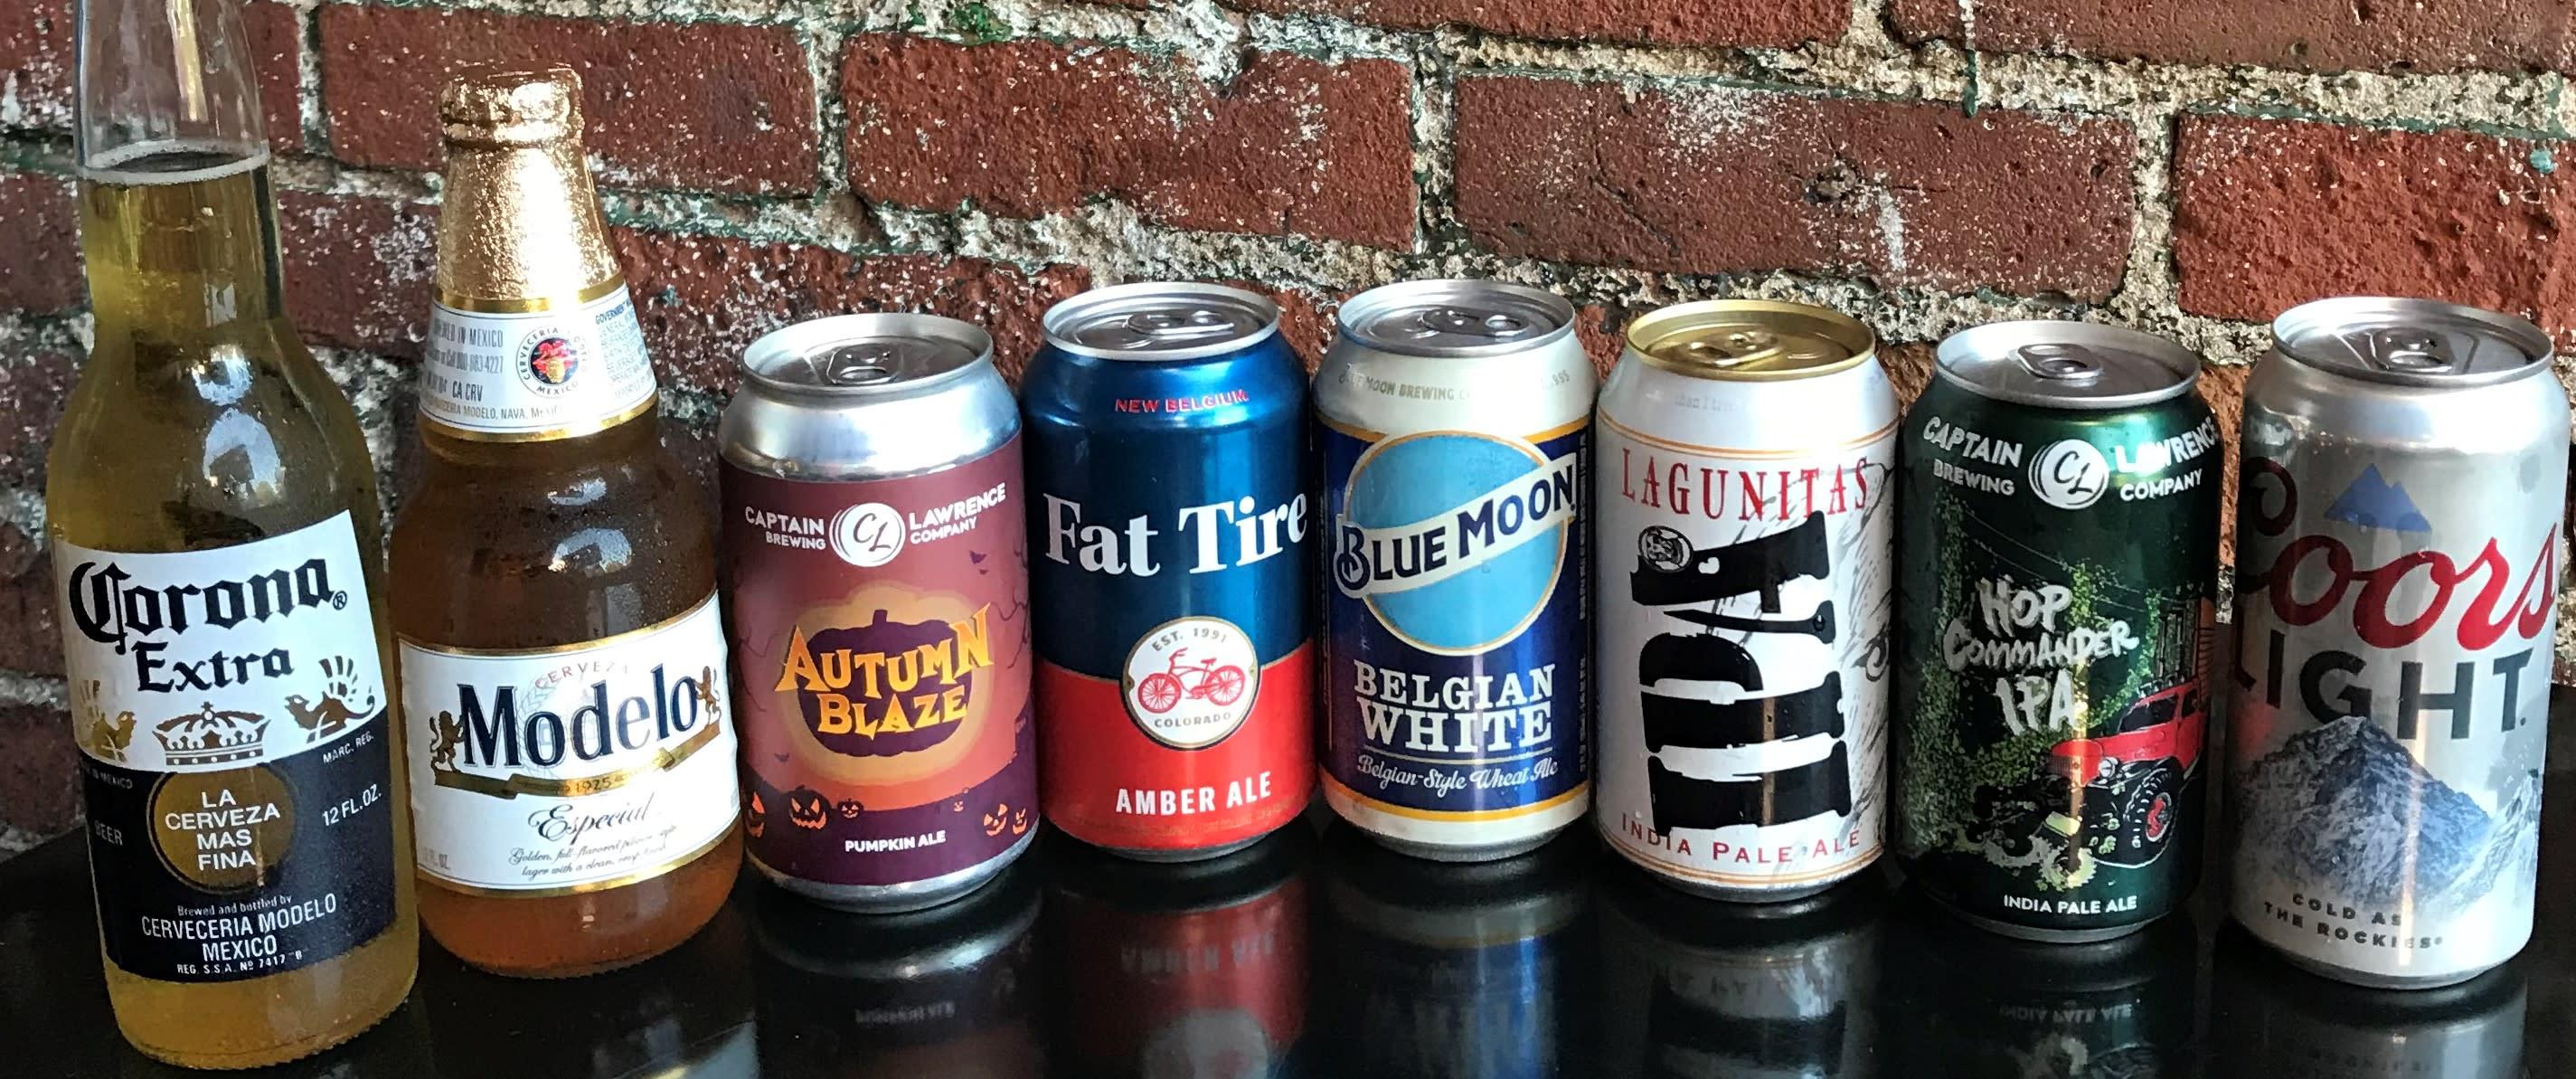 Photo of Beer & Soda